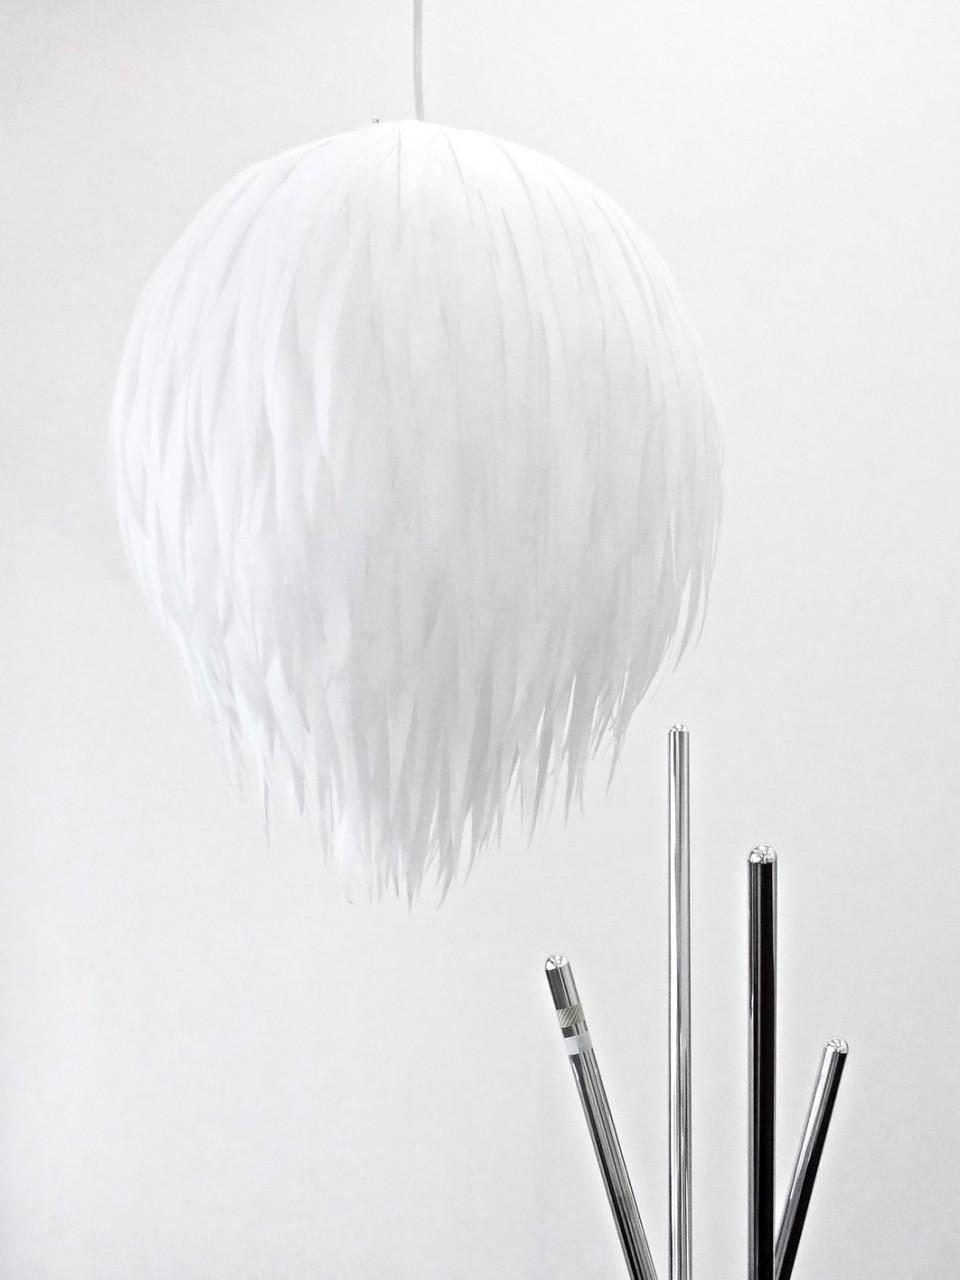 Sunset Serenade (Lampe), 2013, Vlies, Glühbirne, Eurozuleitung, ca. 30 x 50 cm